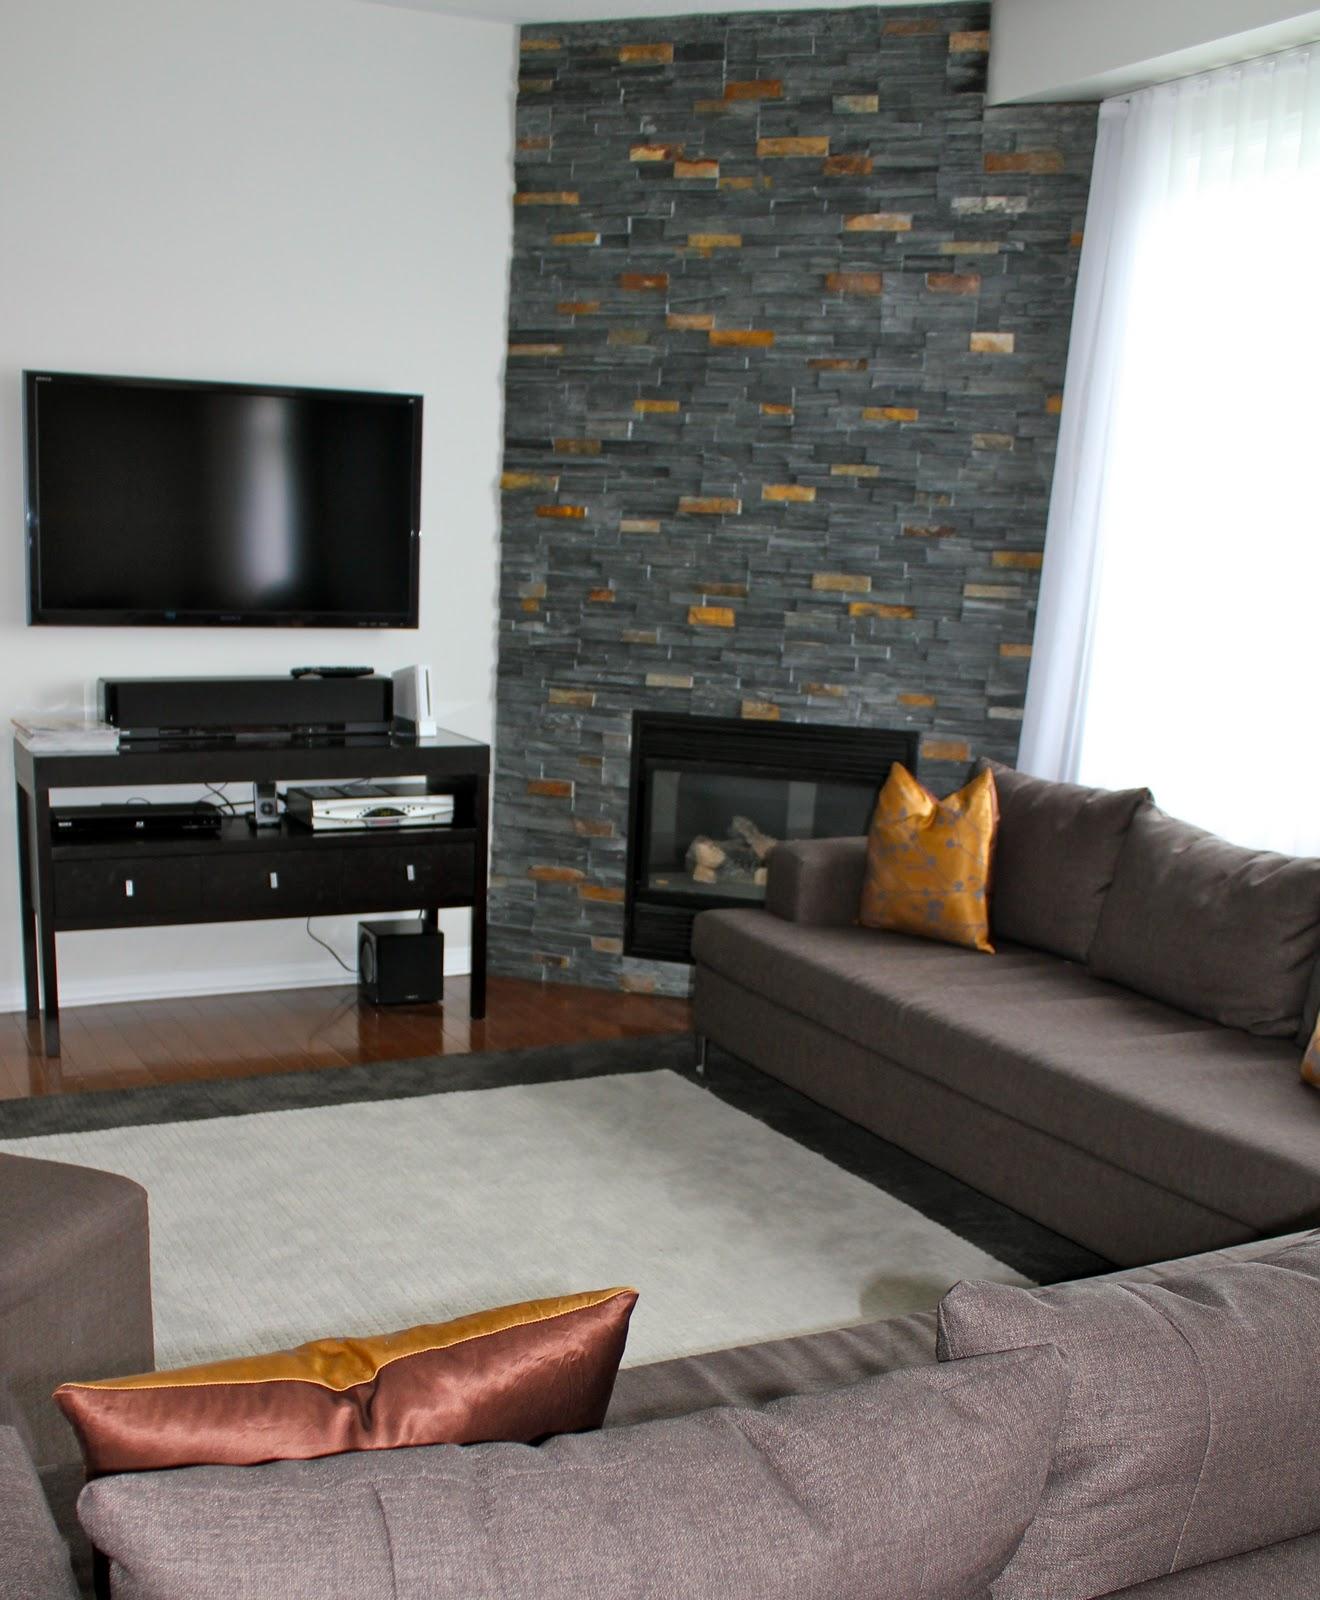 DESIGNWALI: My Desi Home - Corner Fireplace Family Room Photos